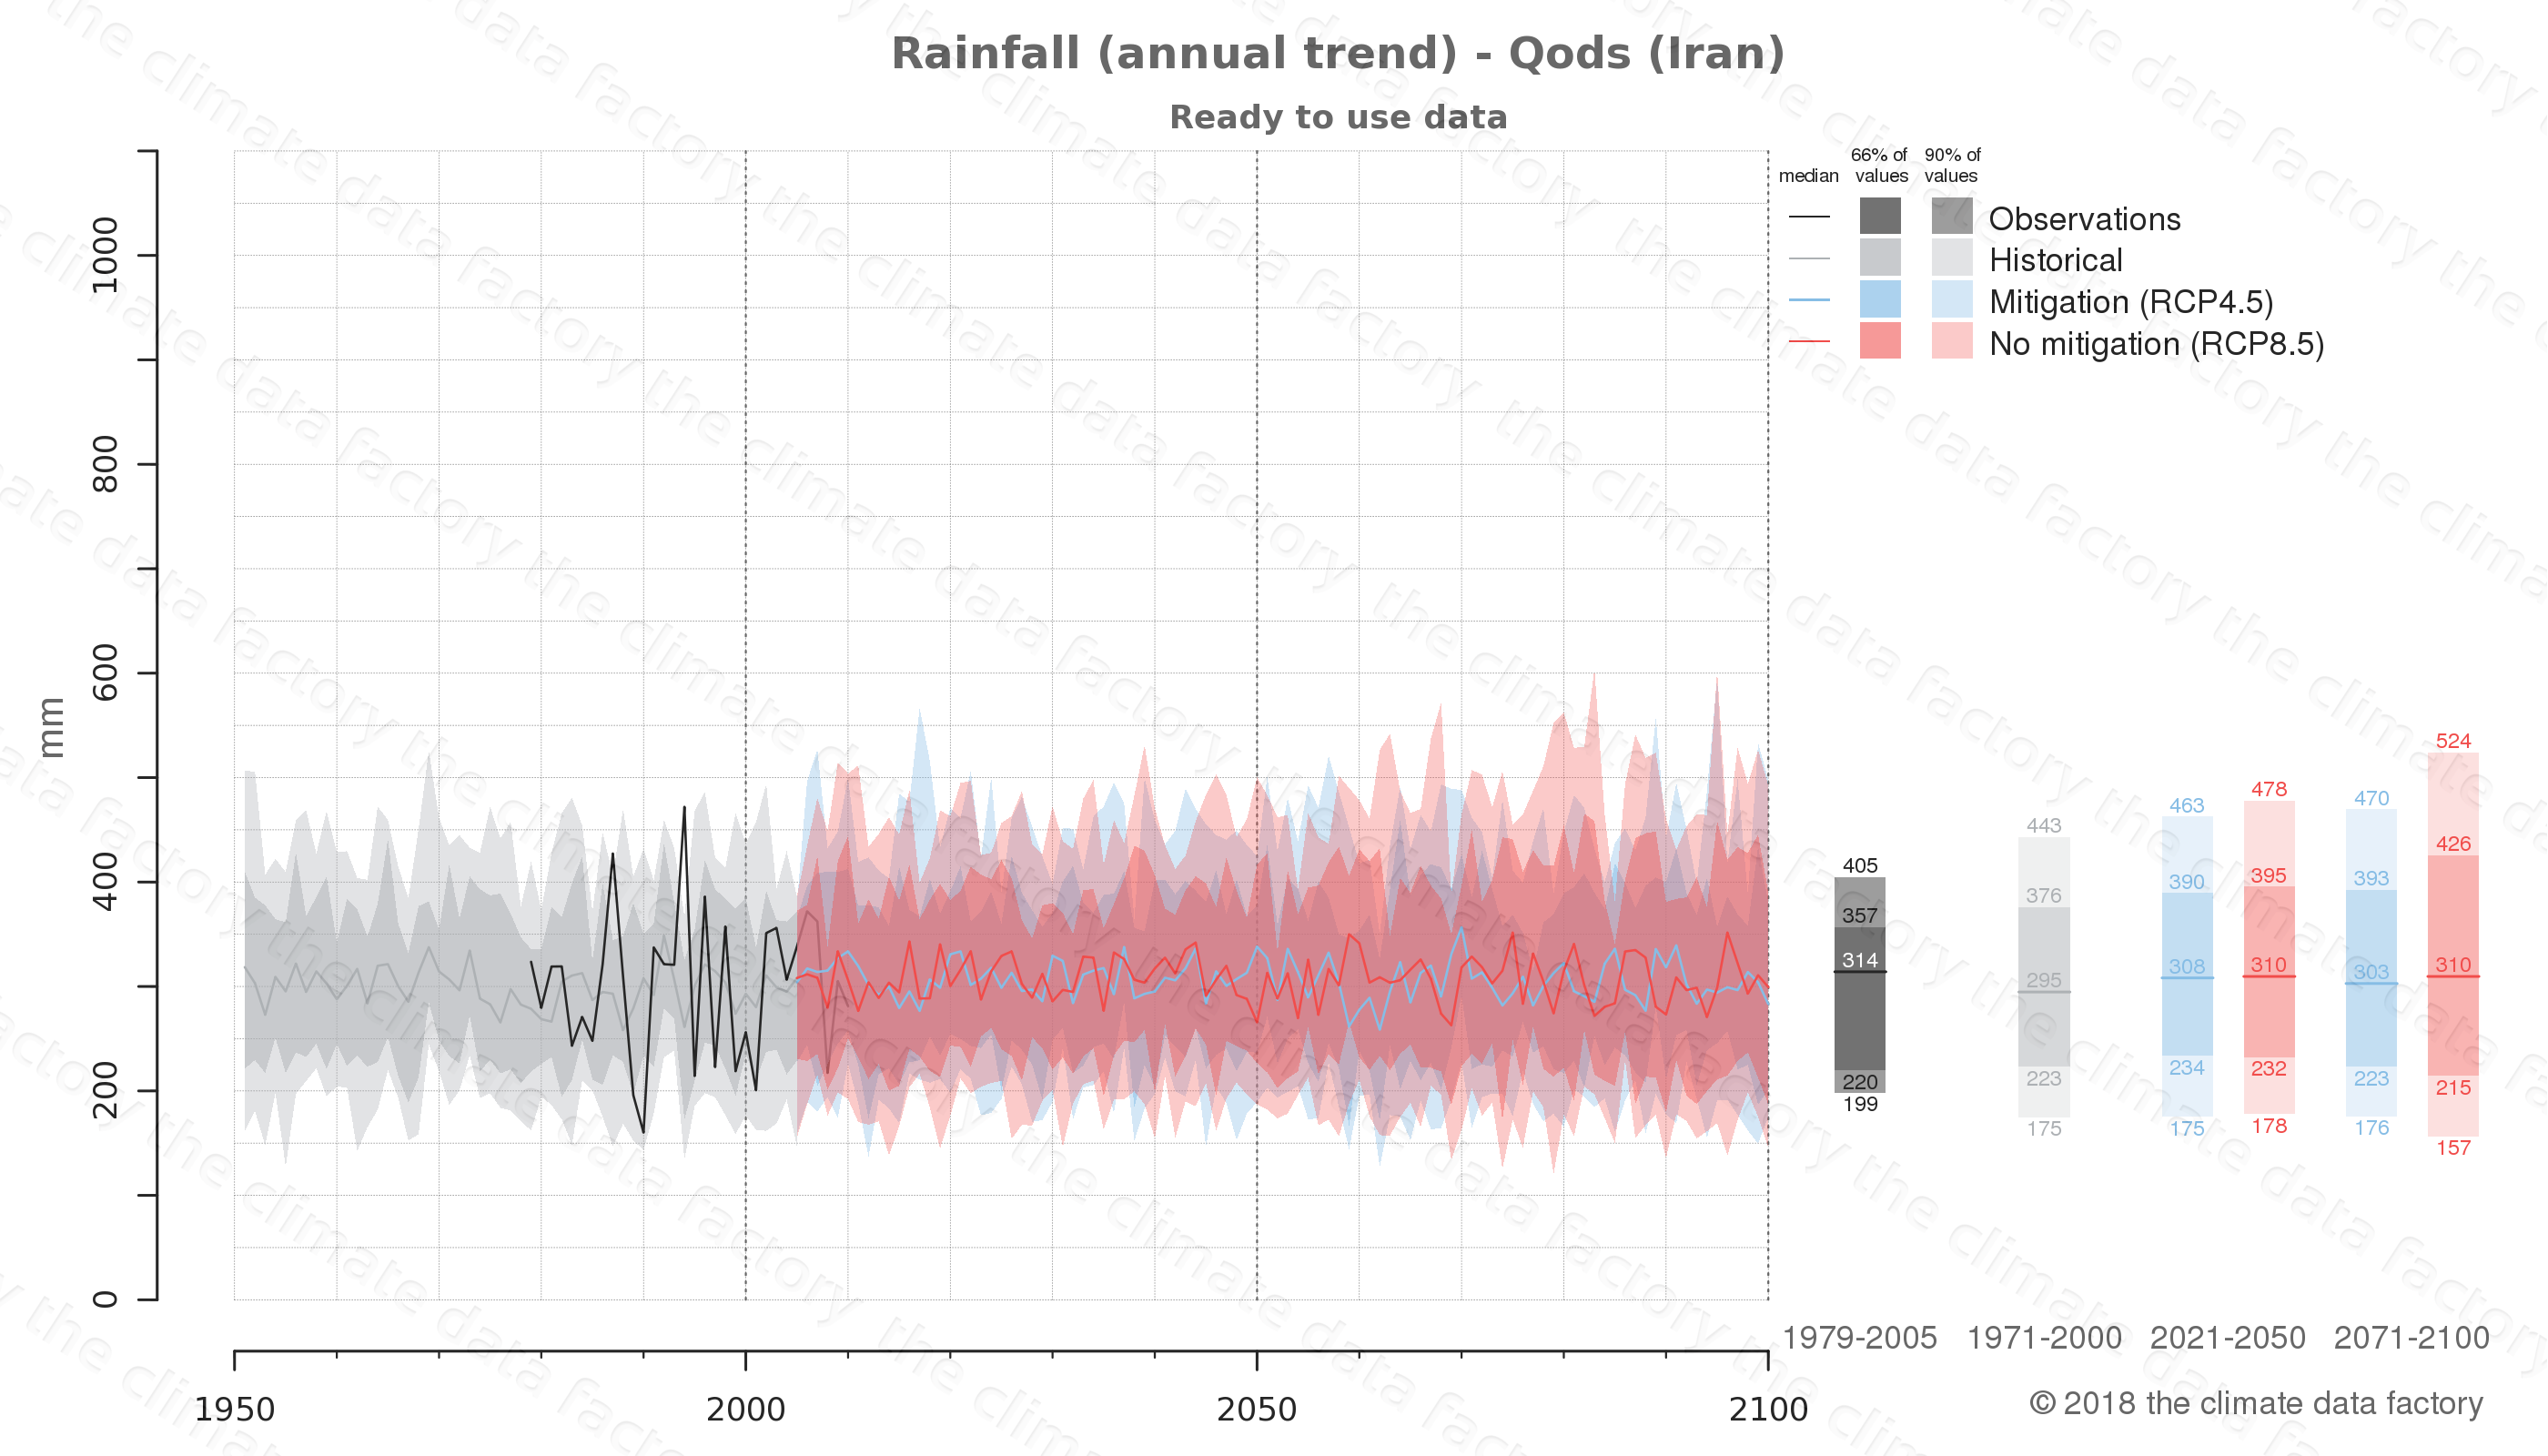 climate change data policy adaptation climate graph city data rainfall qods iran